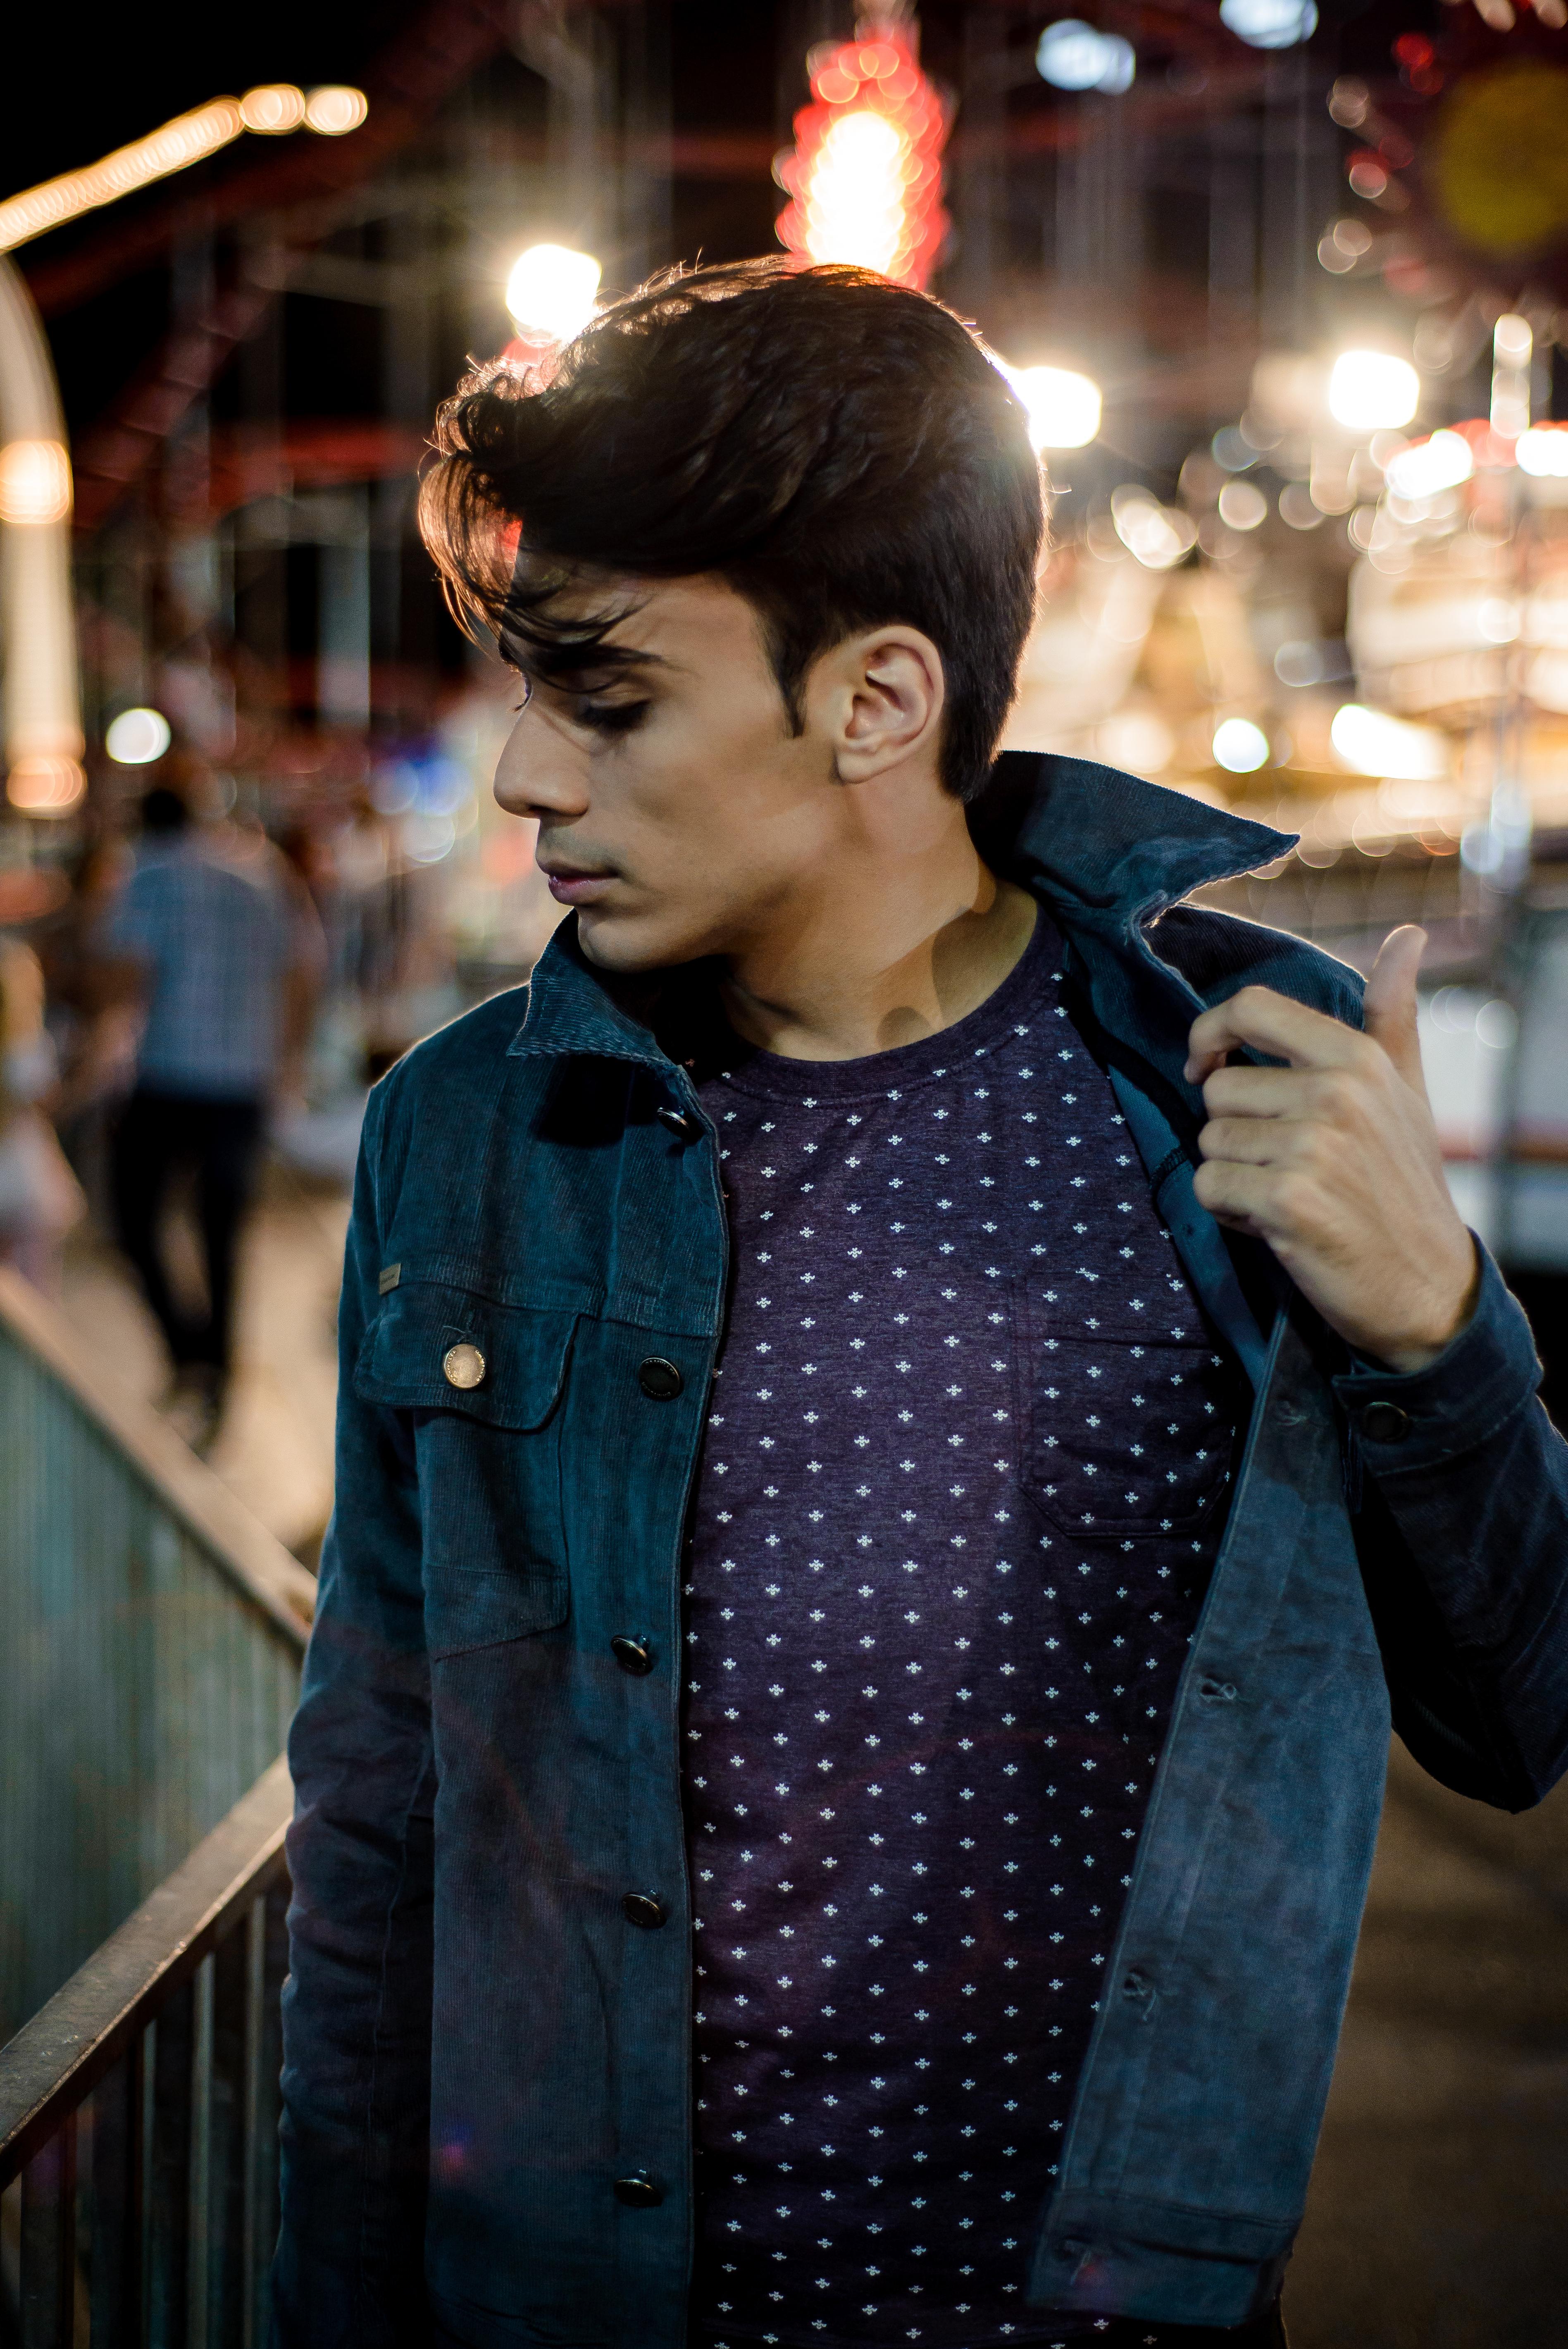 alex cursino, blogueiro de moda masculina, blog de moda masculina, melhores blogueiros do brasil, rafaella santiago, jaqueta bomber masculina, jaqueta jeans masculina, roupa masculina inverno (2)